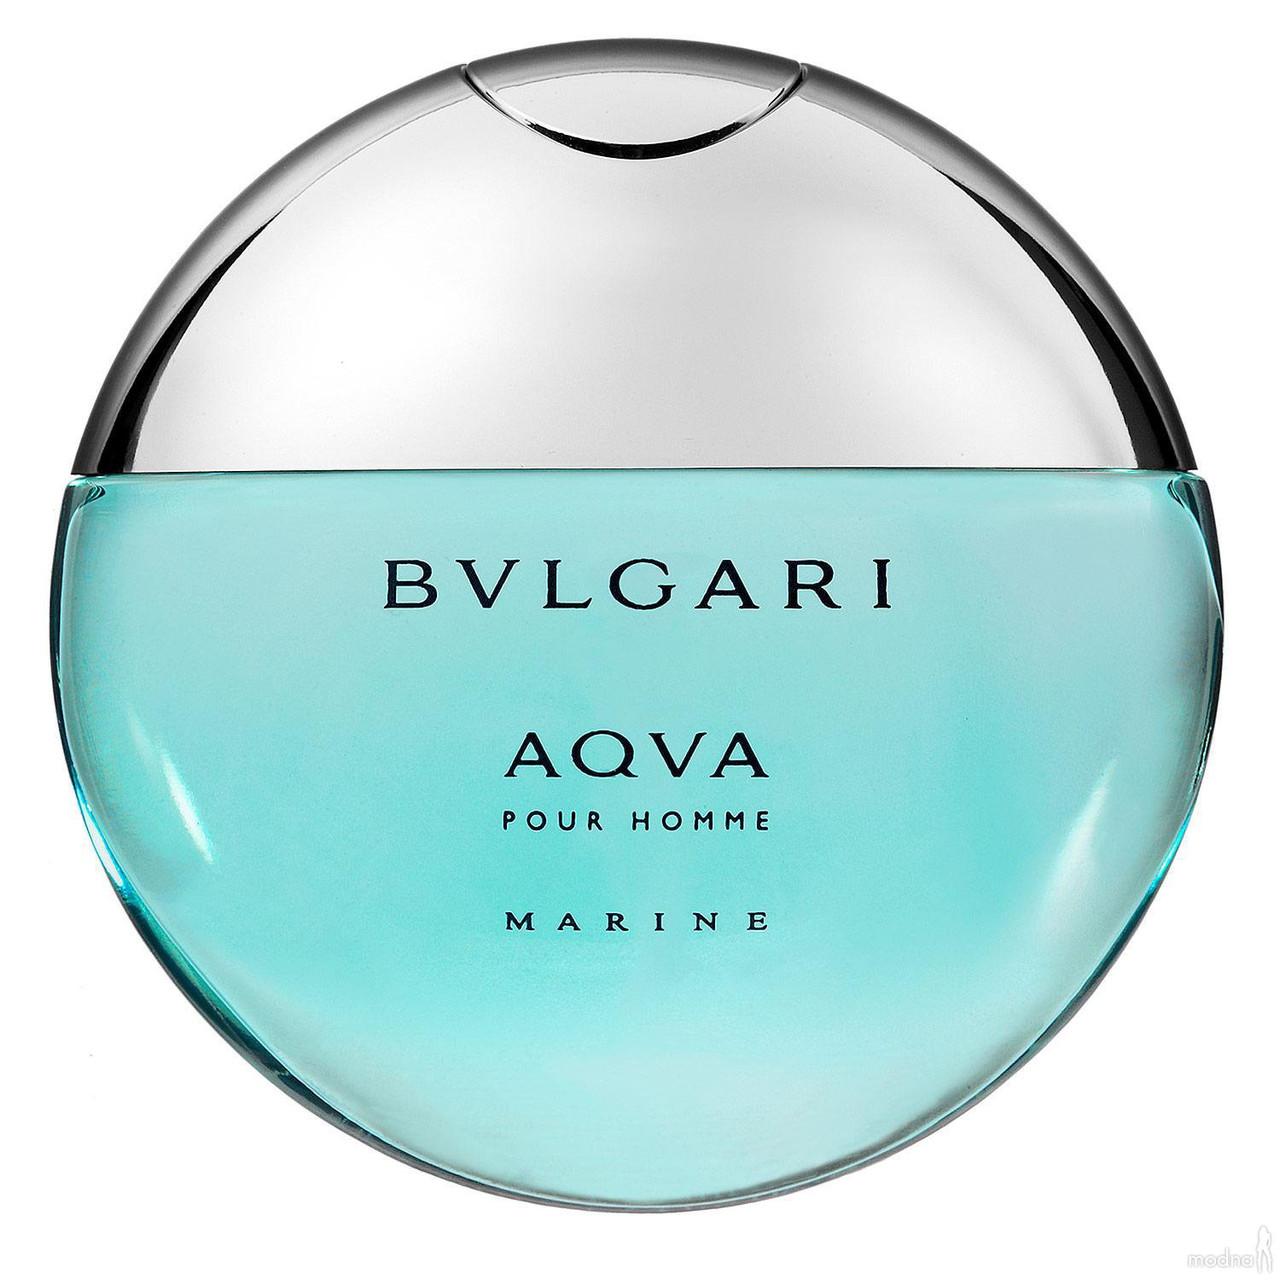 Bvlgari Aqva Pour Homme Marine туалетная вода 100 ml. (Тестер Булгари Аква Пур Хом Марин)